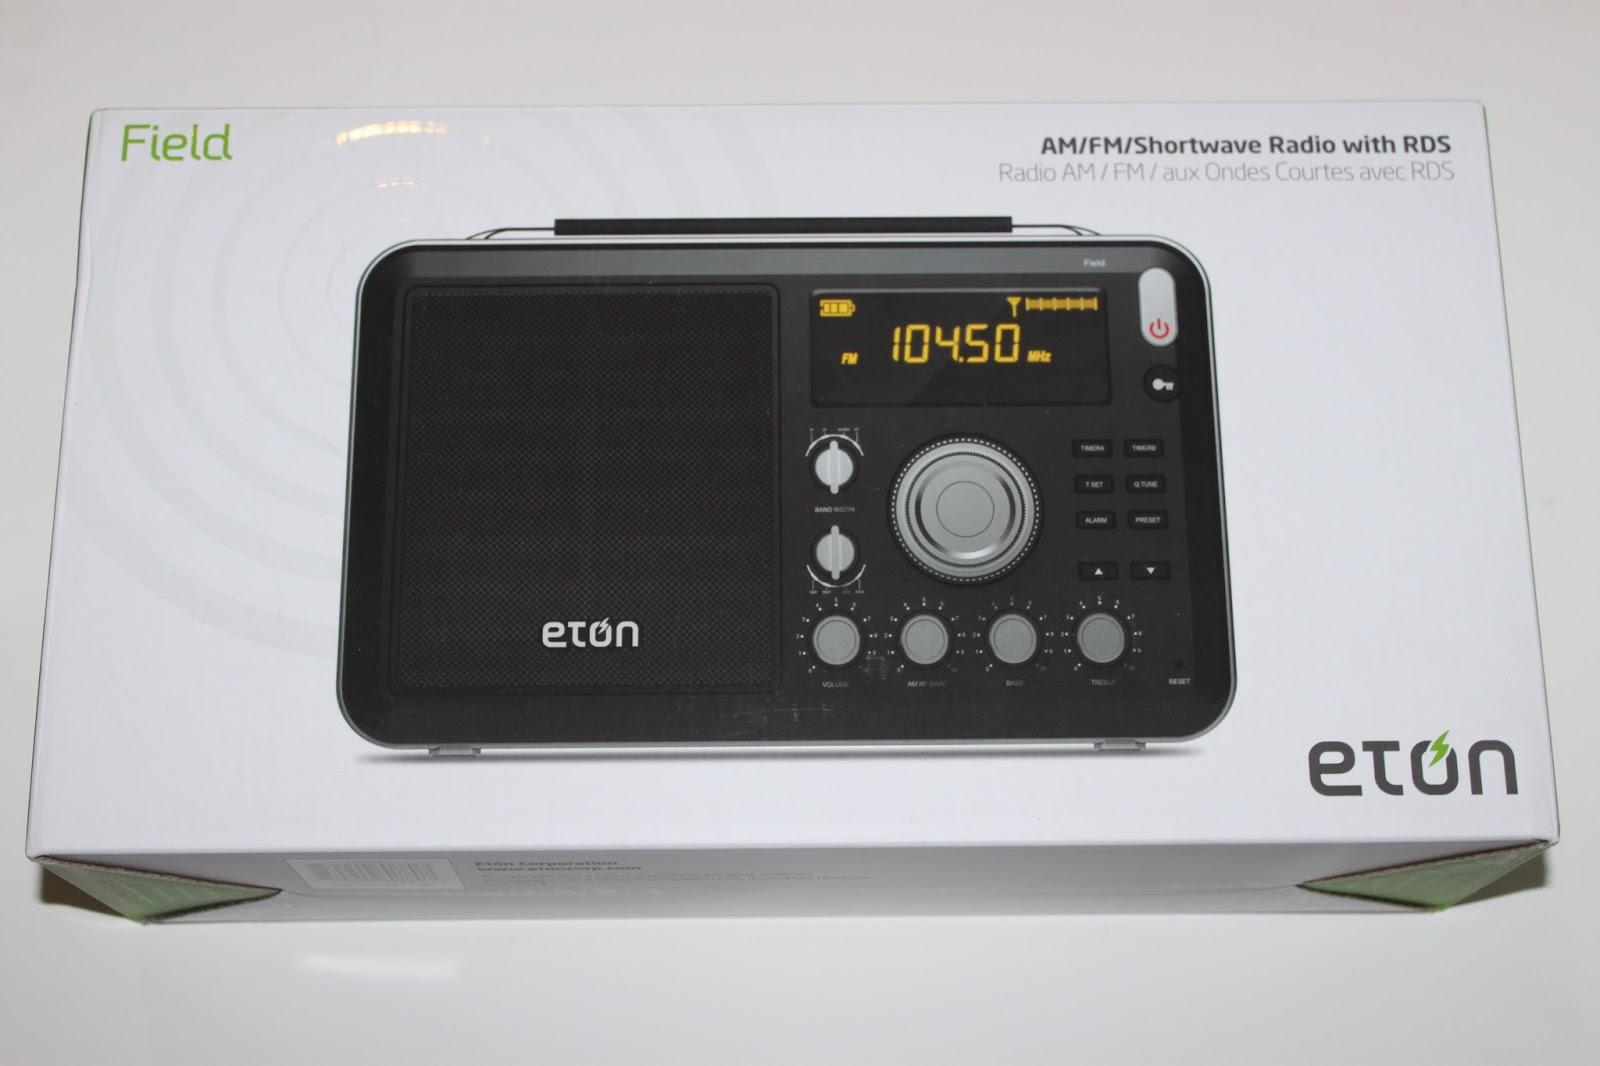 2fbb9f90c2e Stereowise Plus: Prepper Segment Part 3: Eton Field Radio Review